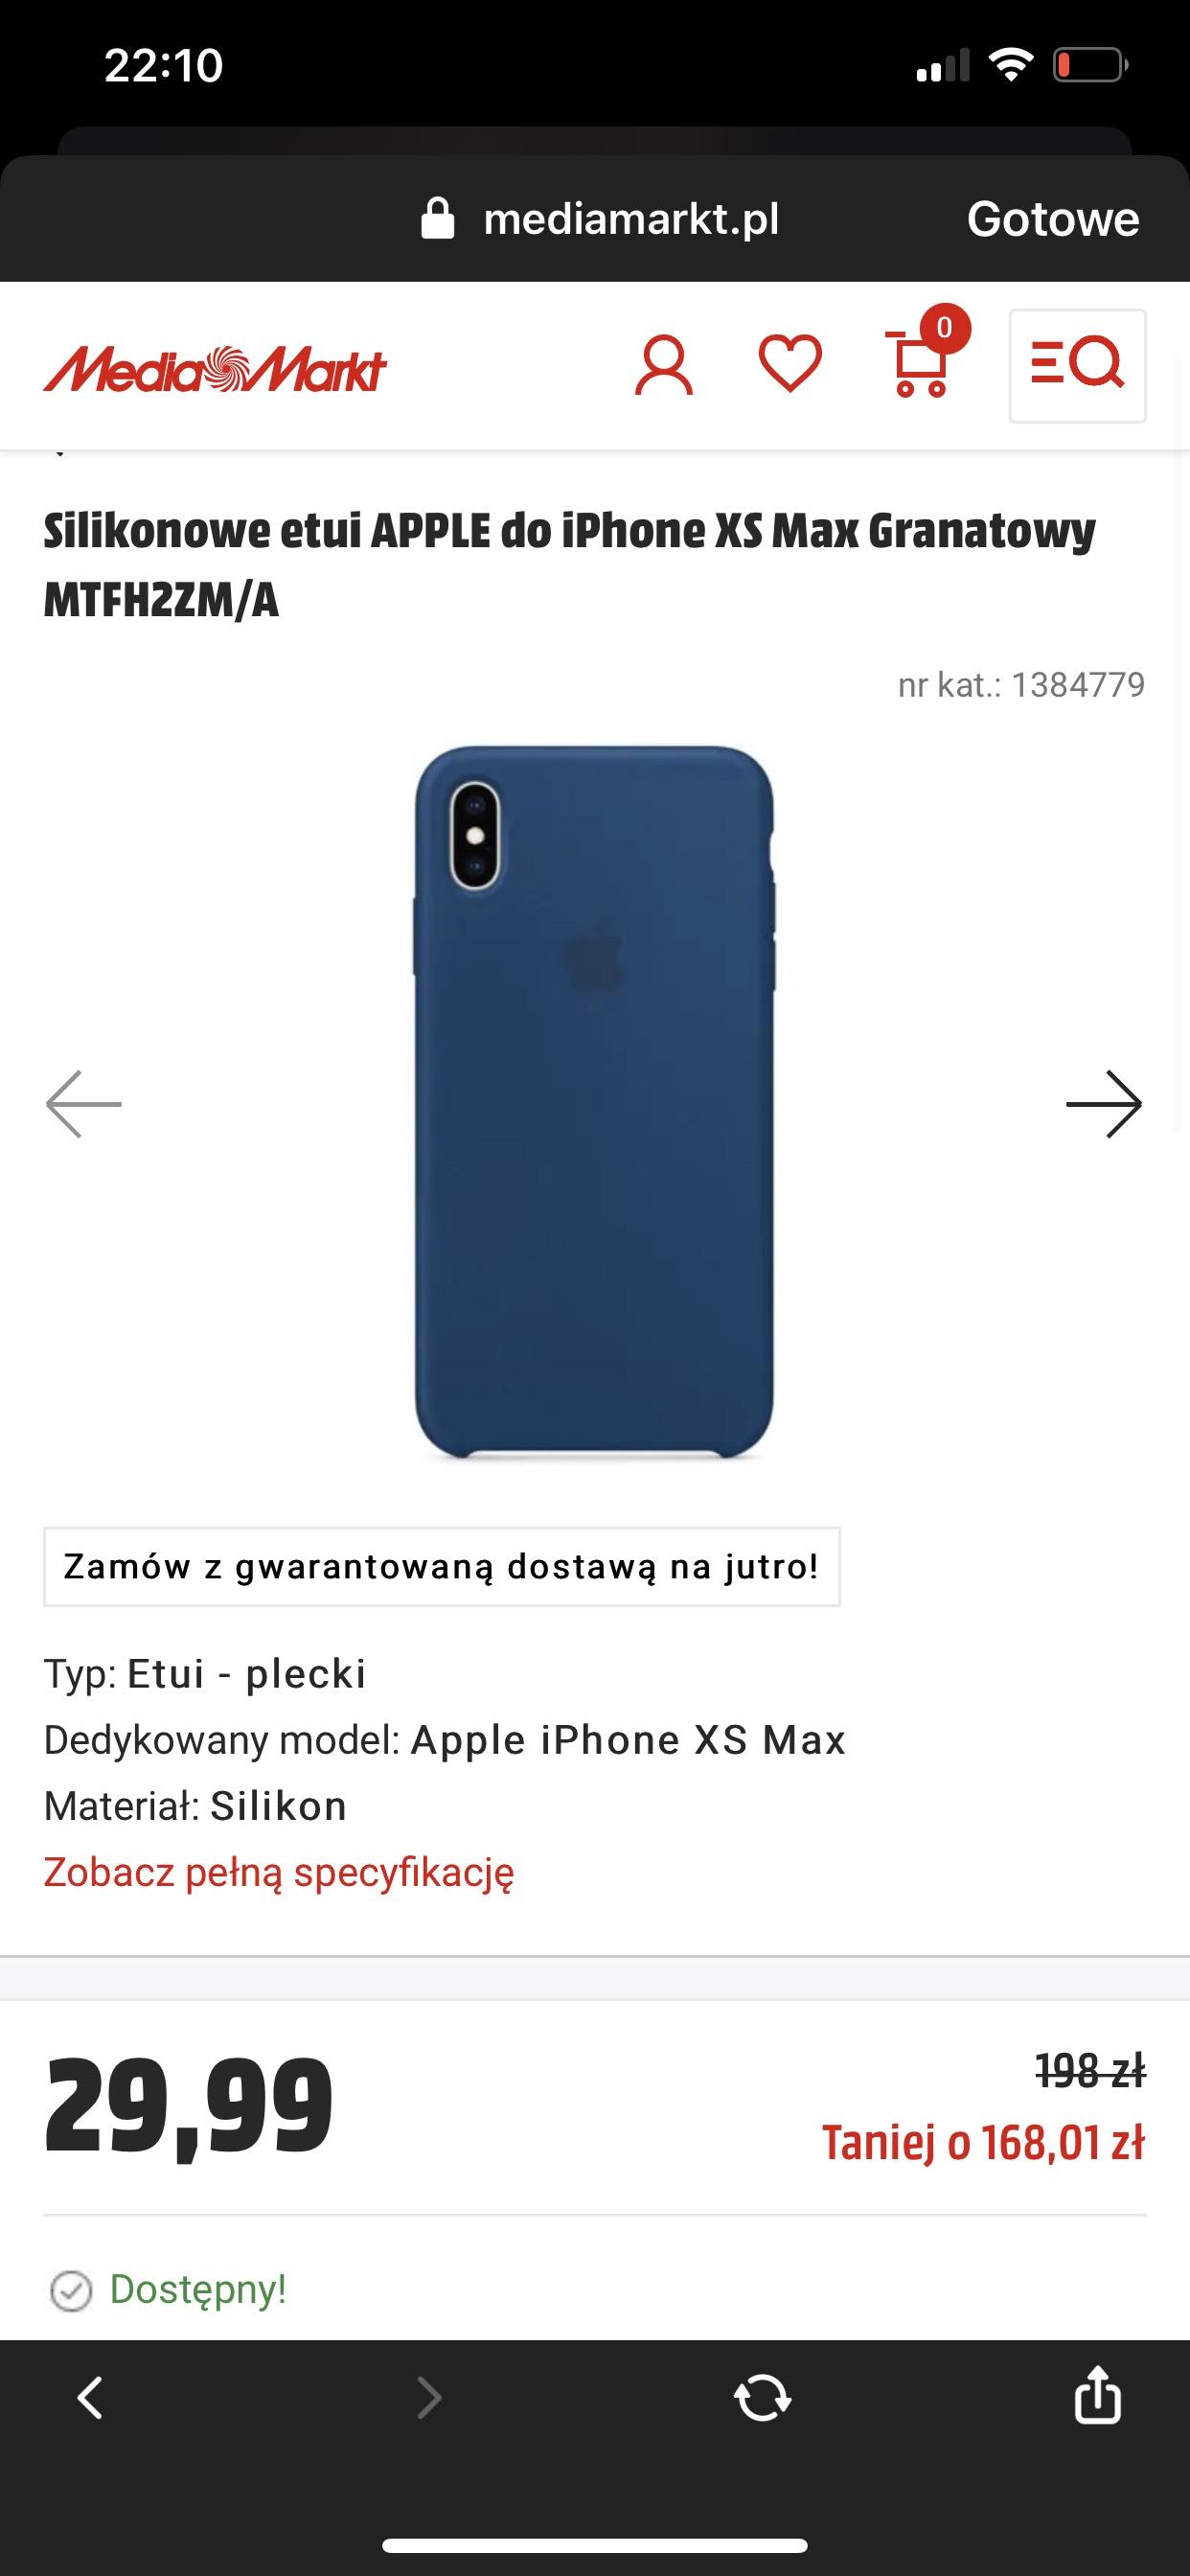 Silikonowe etui APPLE do iPhone XS Max Granatowy MTFH2ZM/A